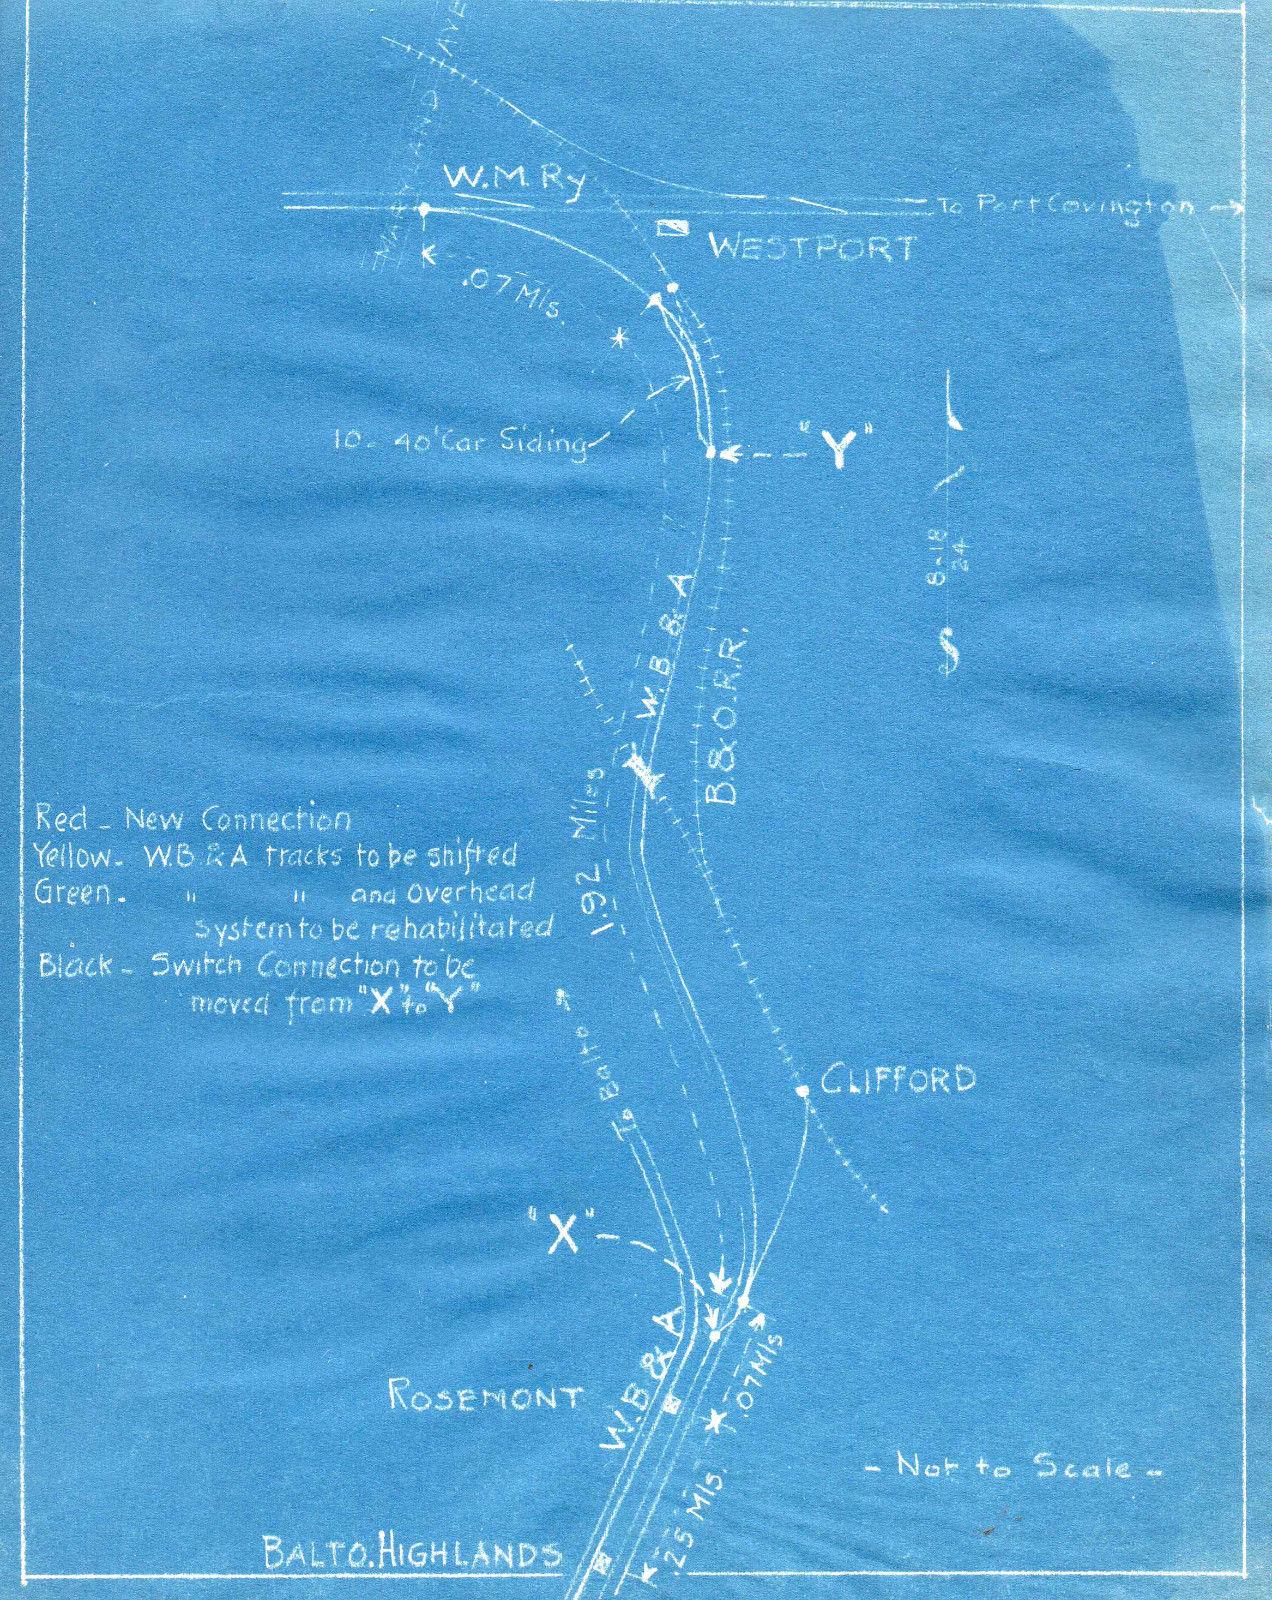 Washington, Baltimore & Annapolis Railroad Blueprints showing Westport Station. Date: Unknown. Source: Unknown.